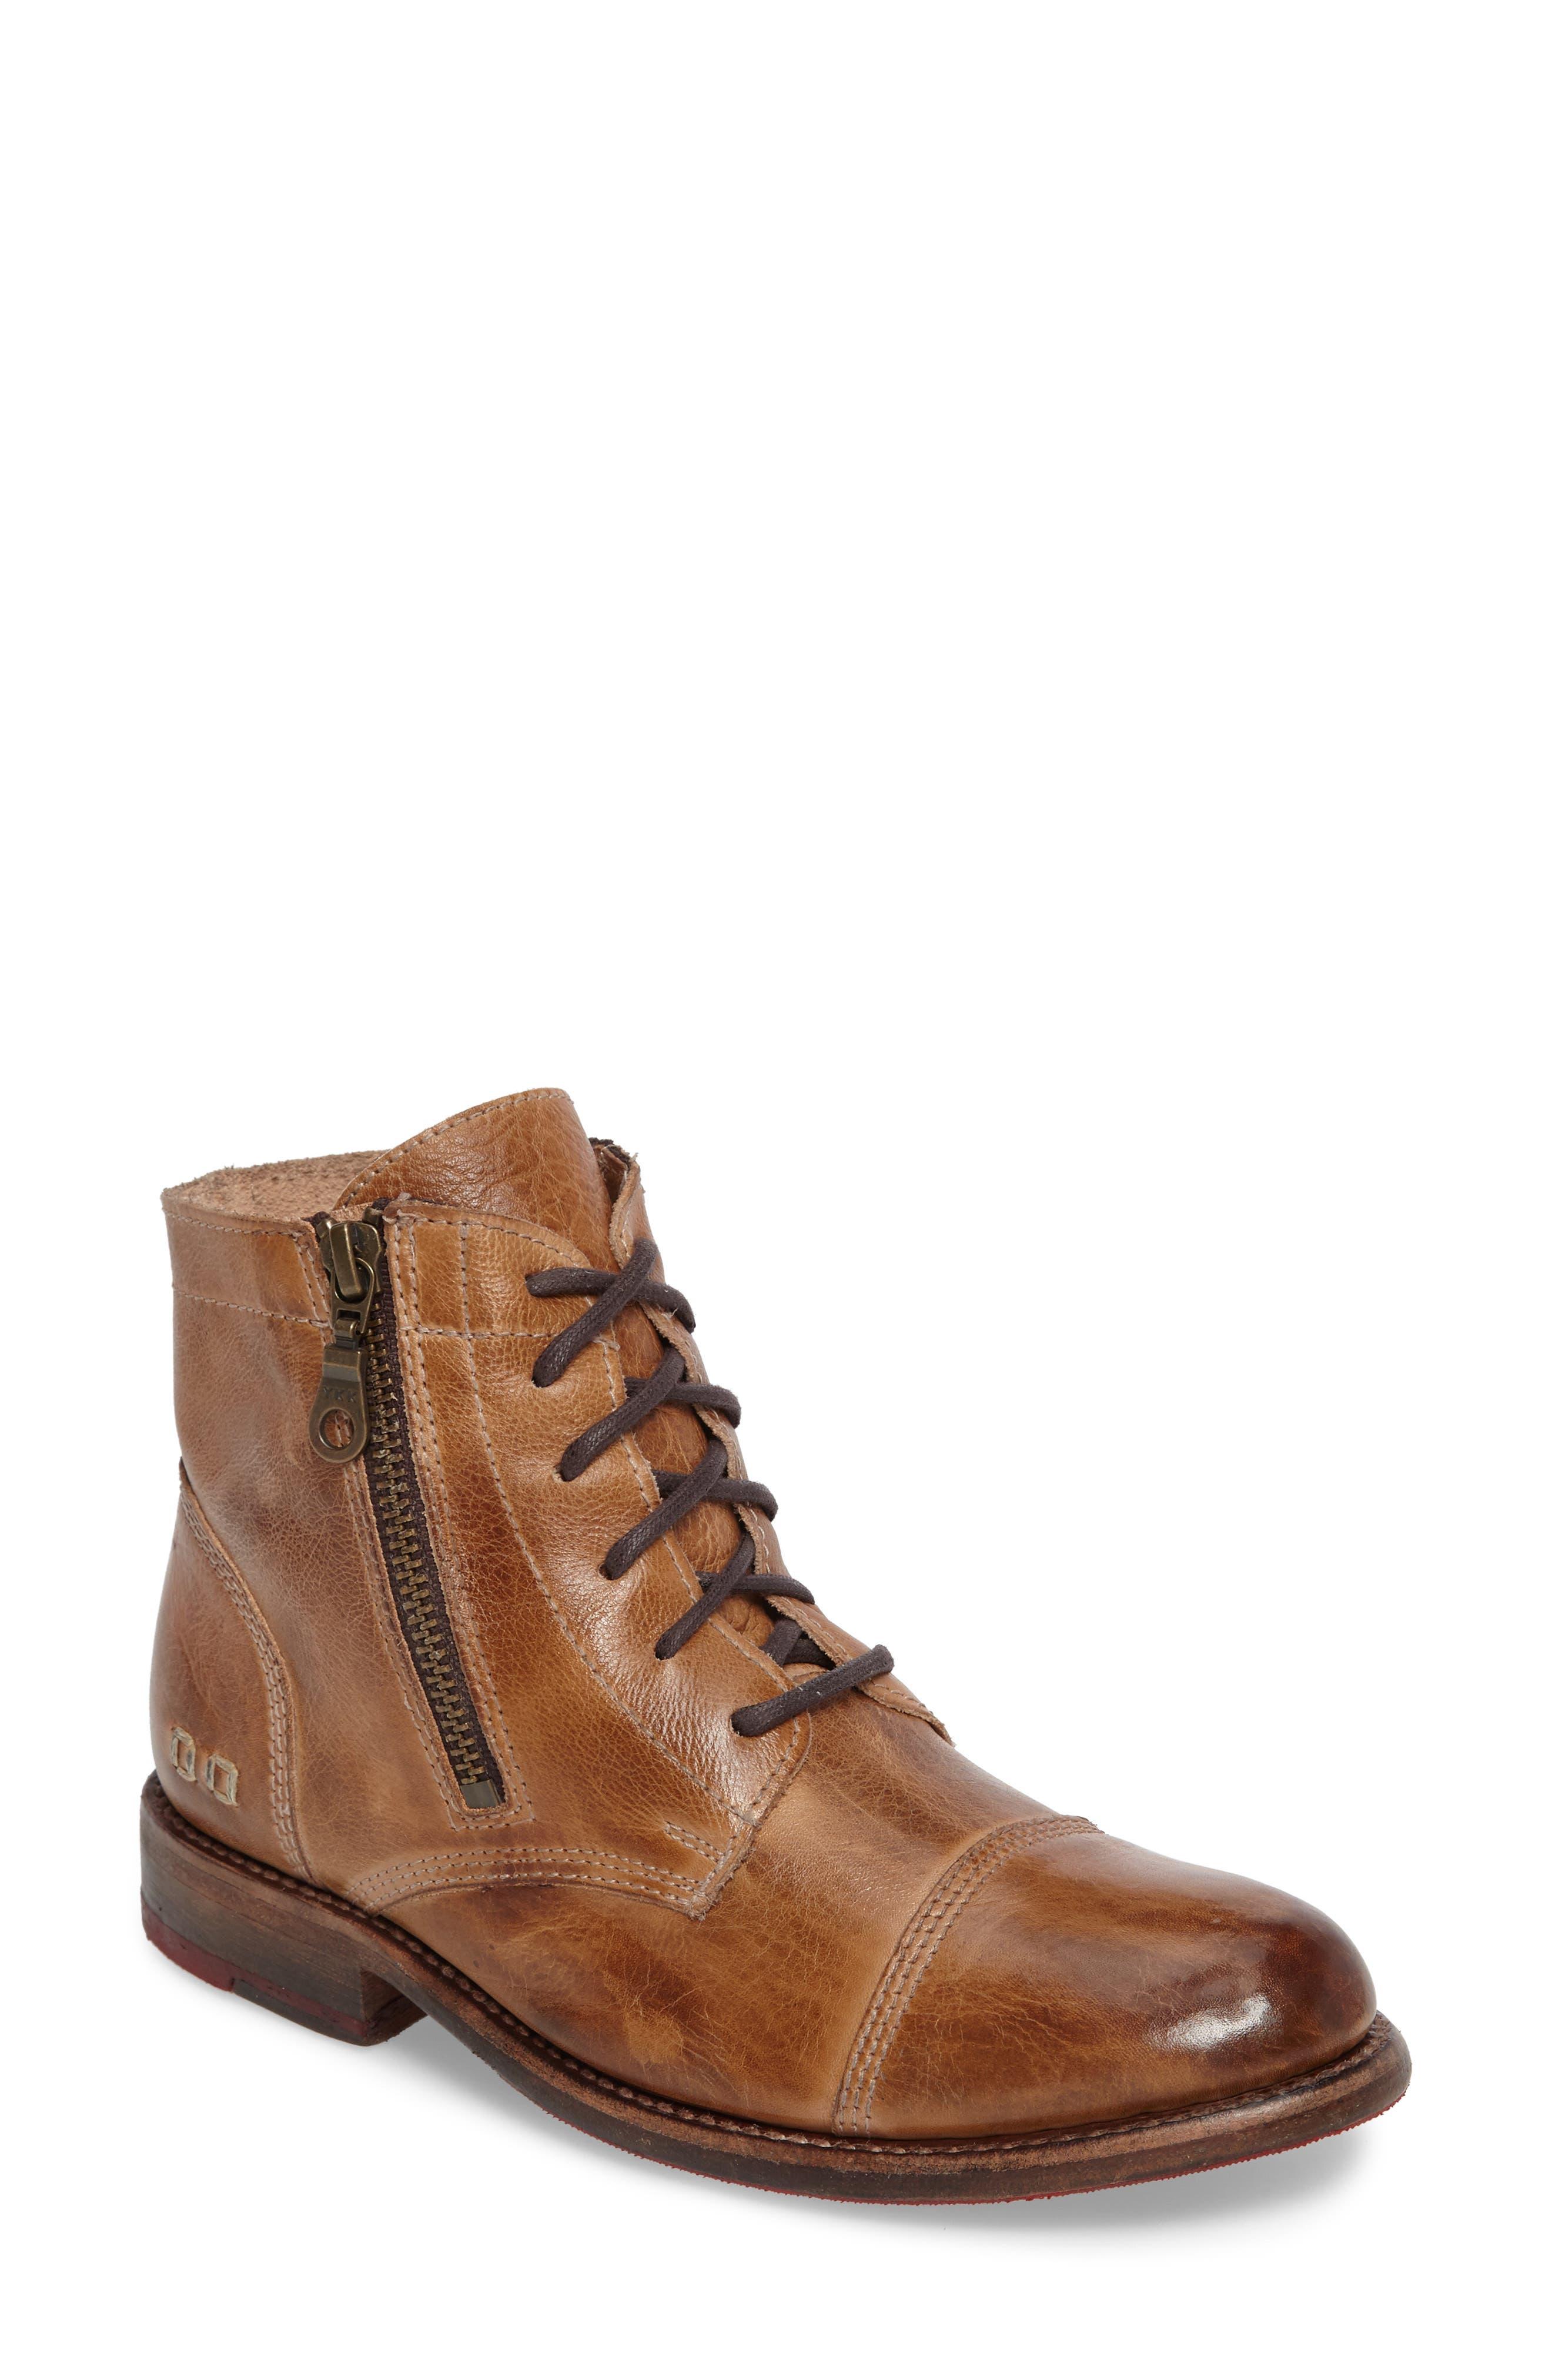 Main Image - Bed Stu 'Bonnie' Boot